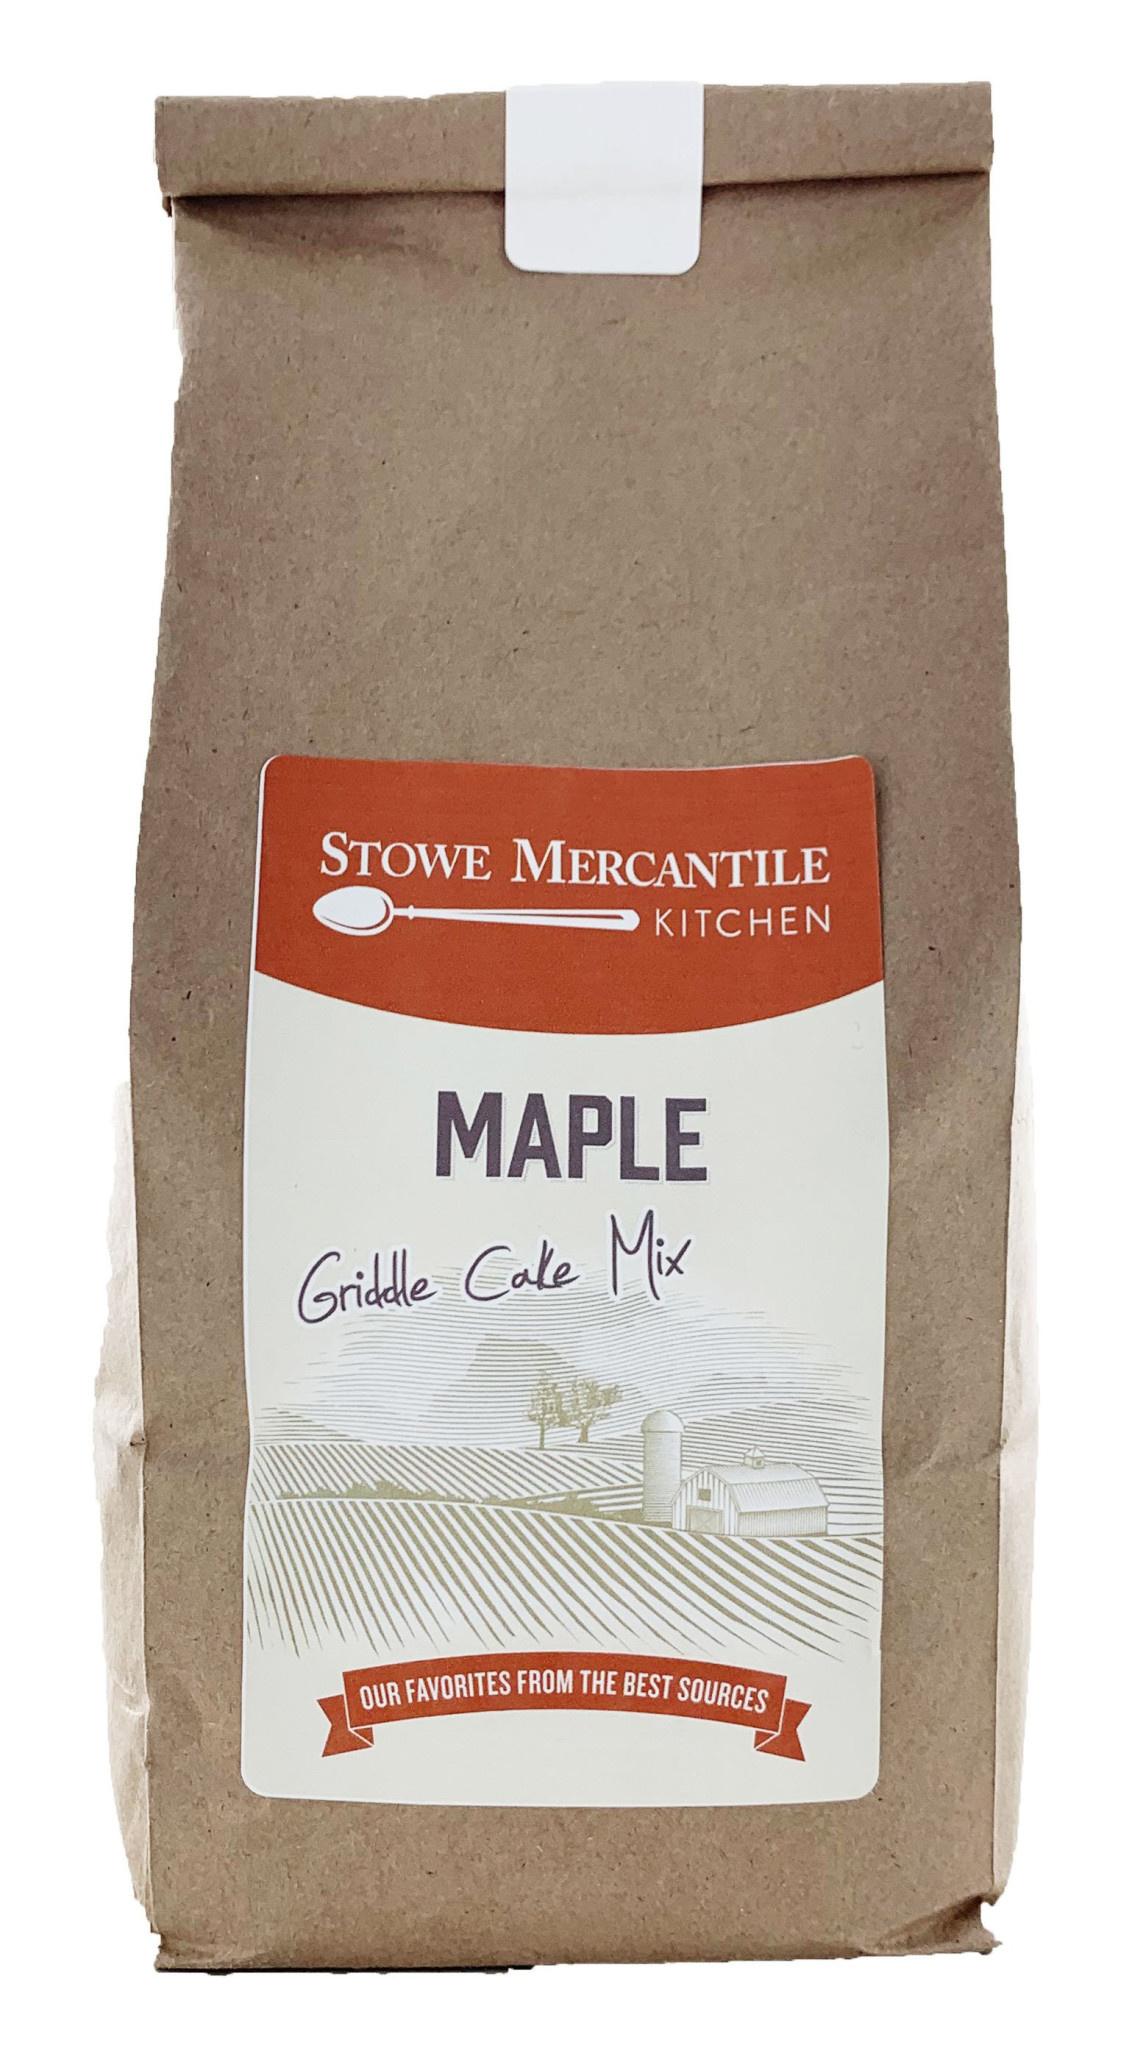 Stowe Mercantile Kitchen Griddle Cake Mix 1lb Maple